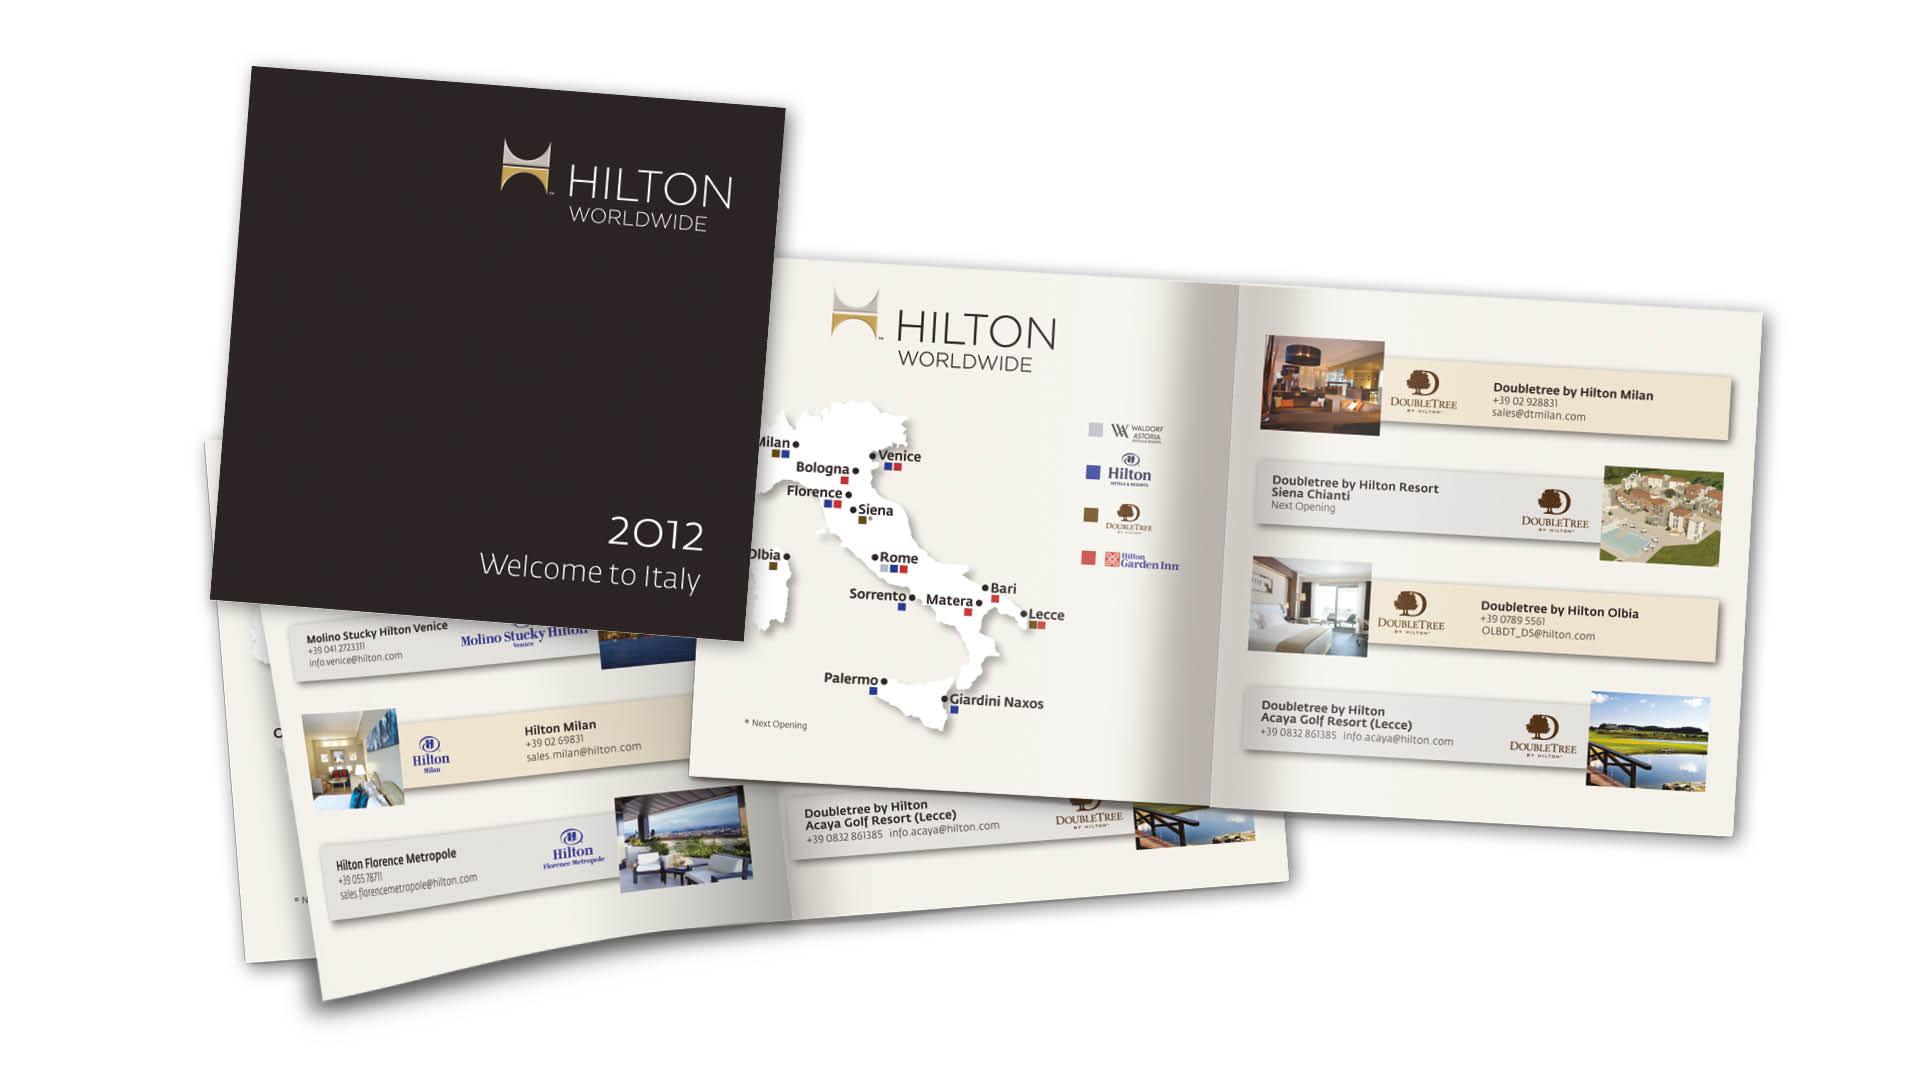 Hilton, BTL